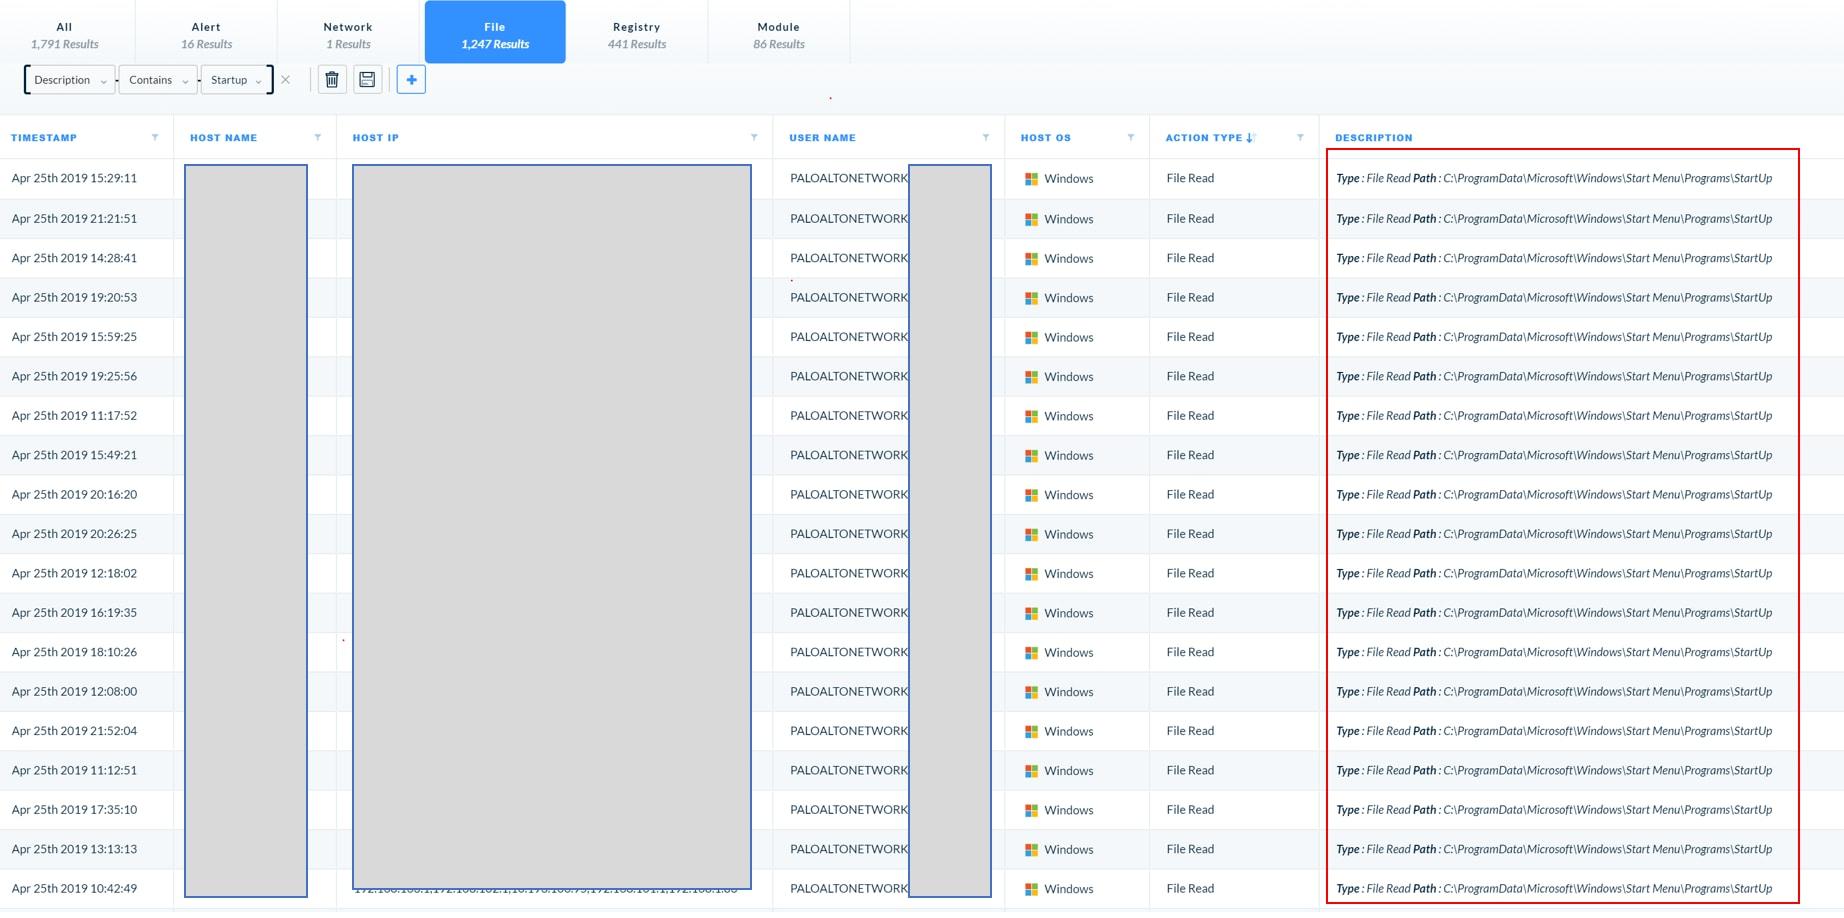 [File] タブを開いたところ。同じファイルが [StartUp] メニューから繰り返し読み出されている様子が確認できる